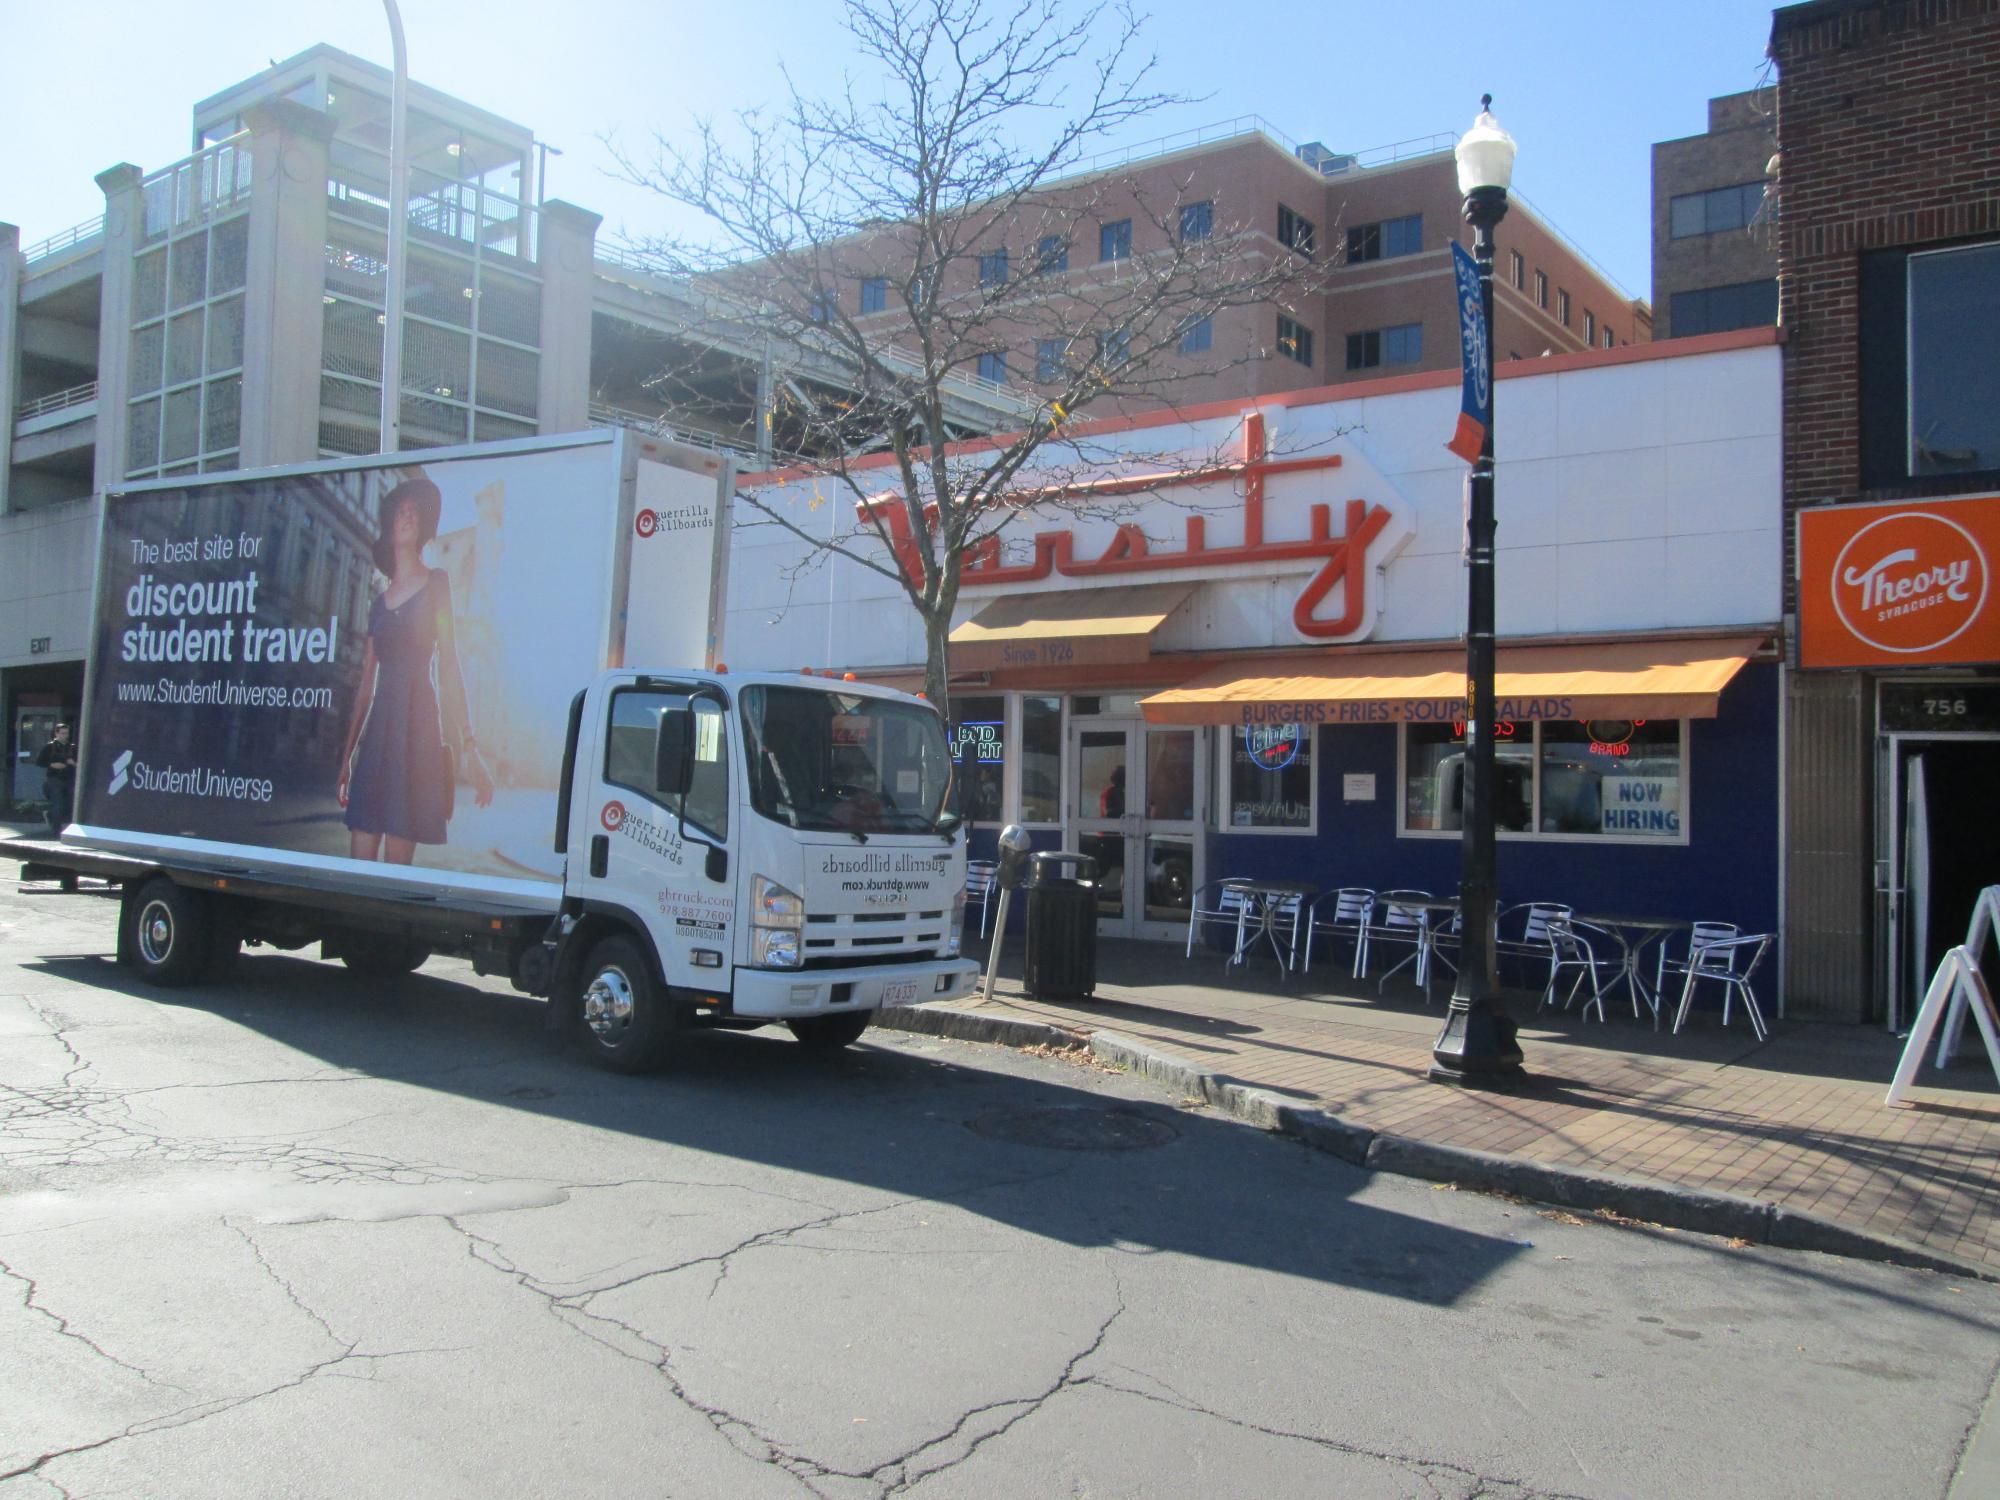 Mobile billboard truck at Syracuse University